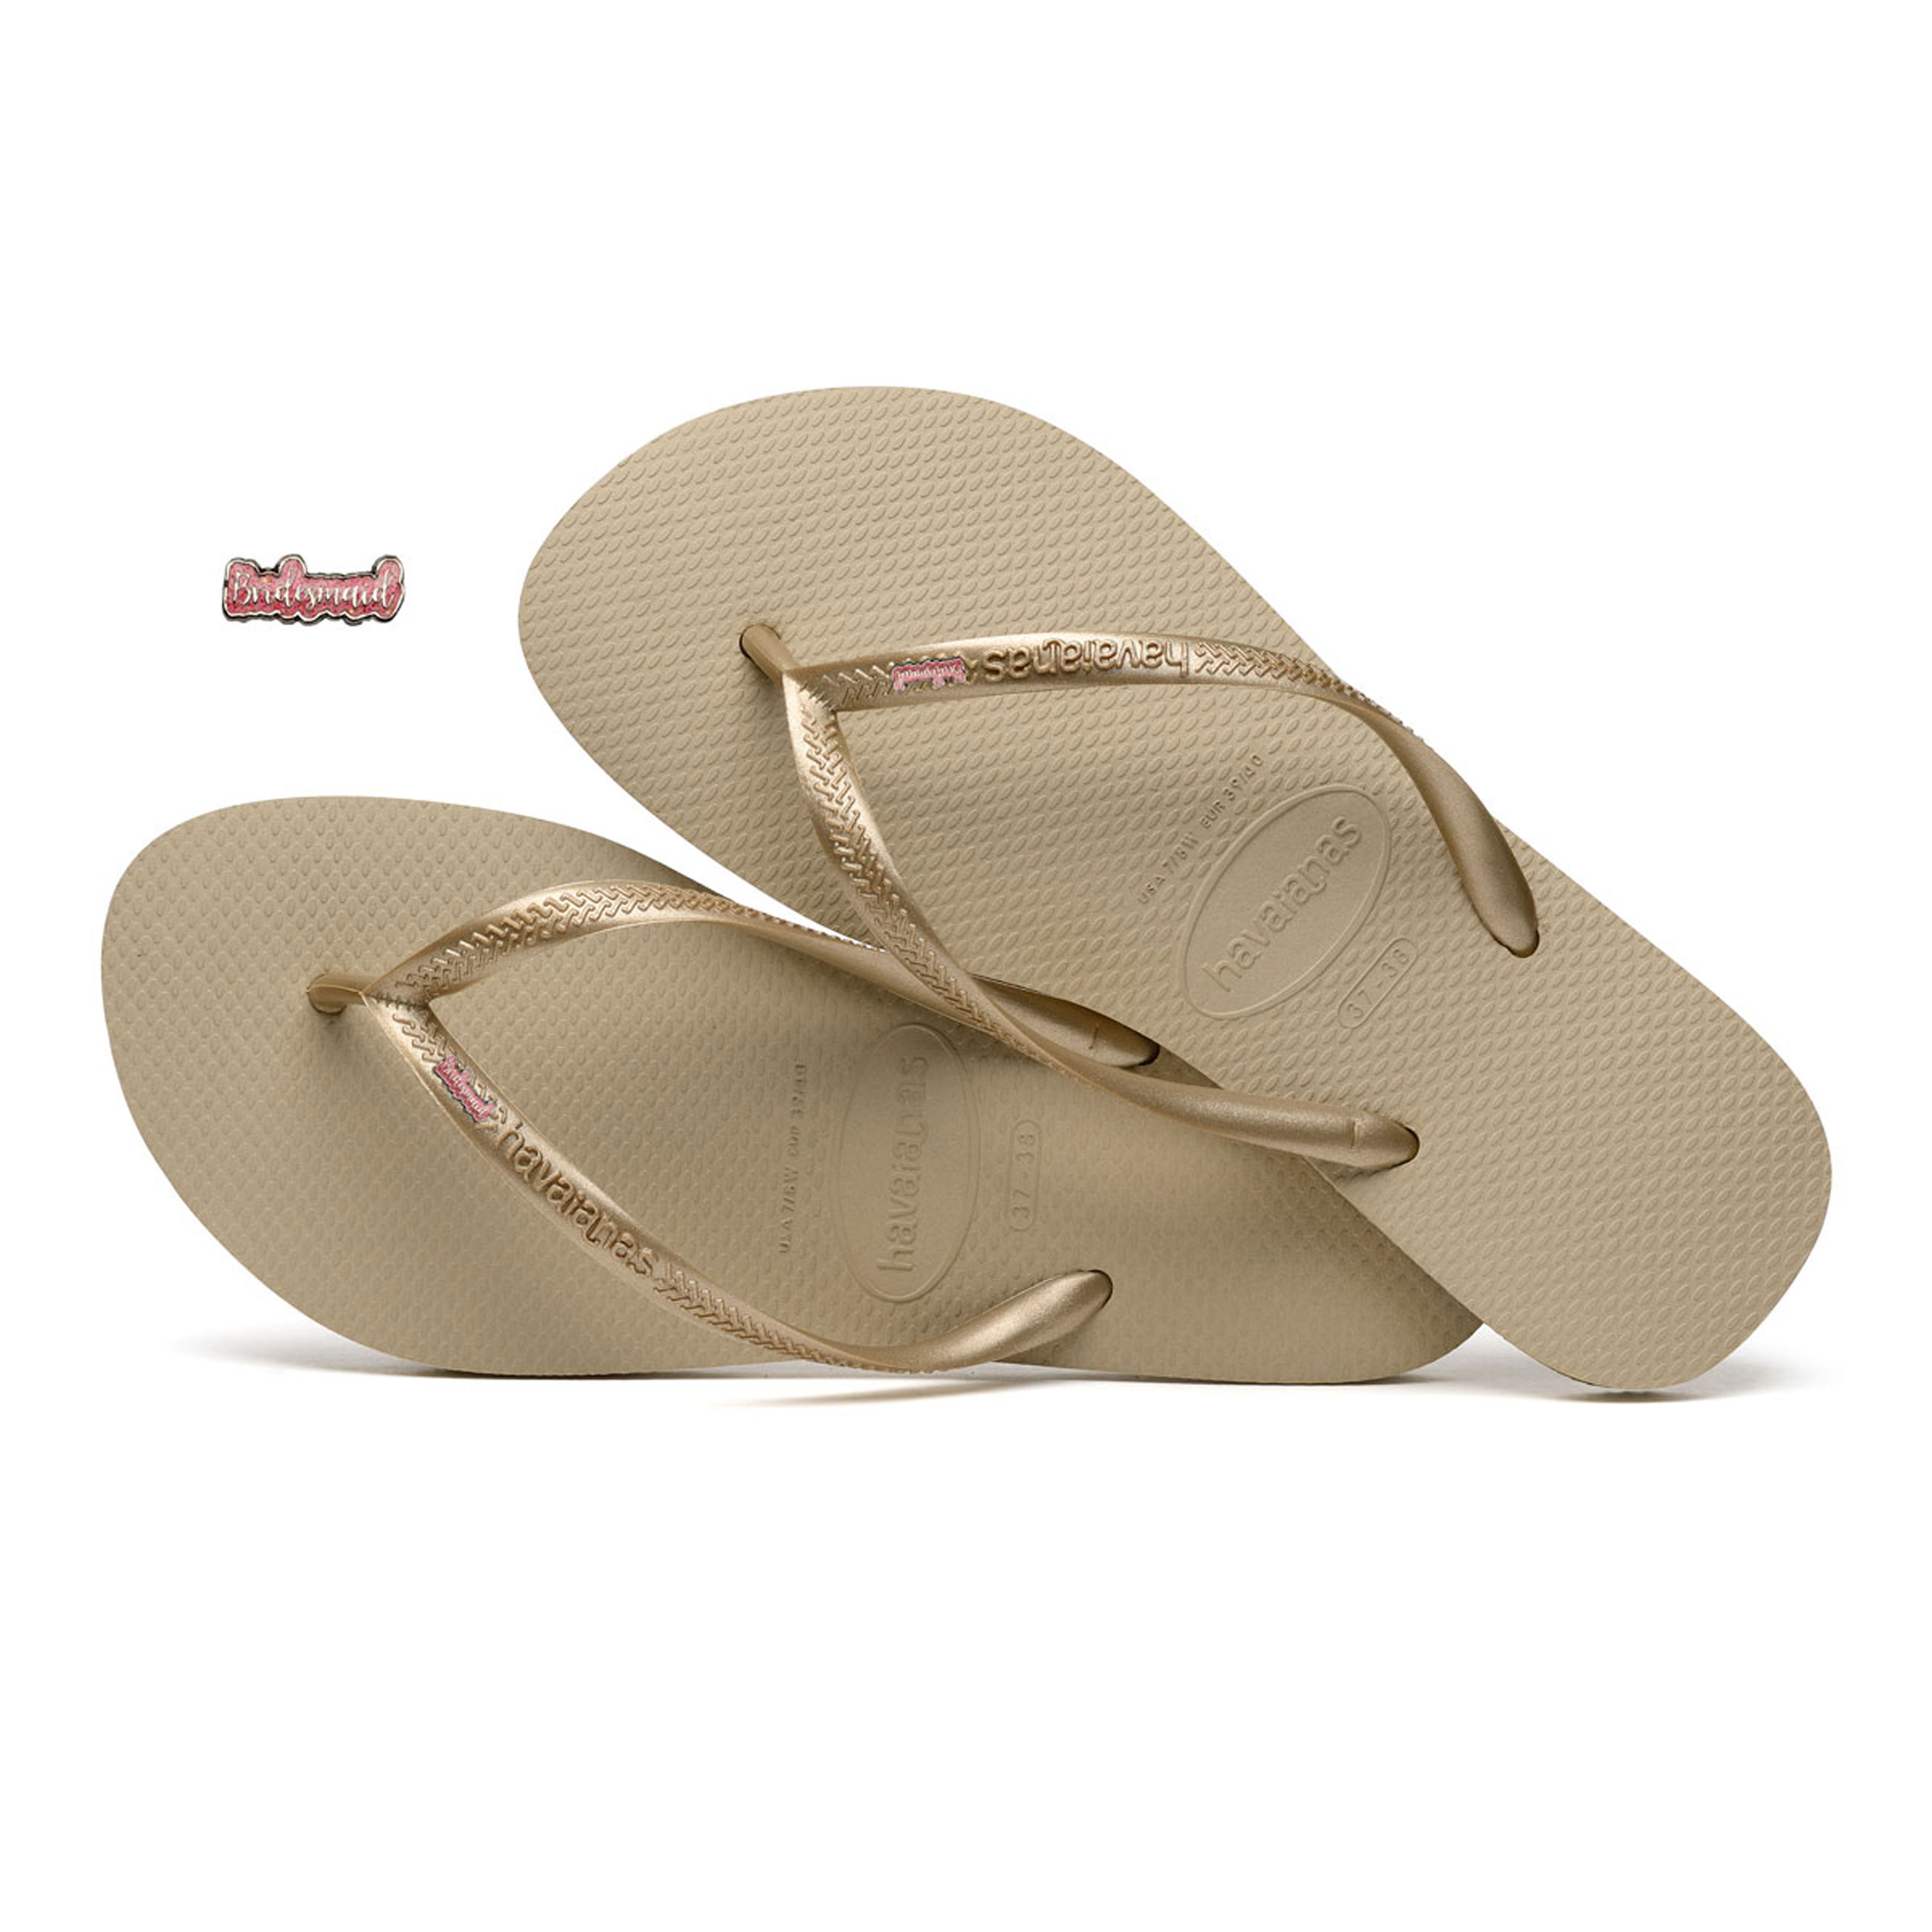 Havaianas Sand Grey Slim Flip-Flops with Pink Bridesmaid Wedding Gift